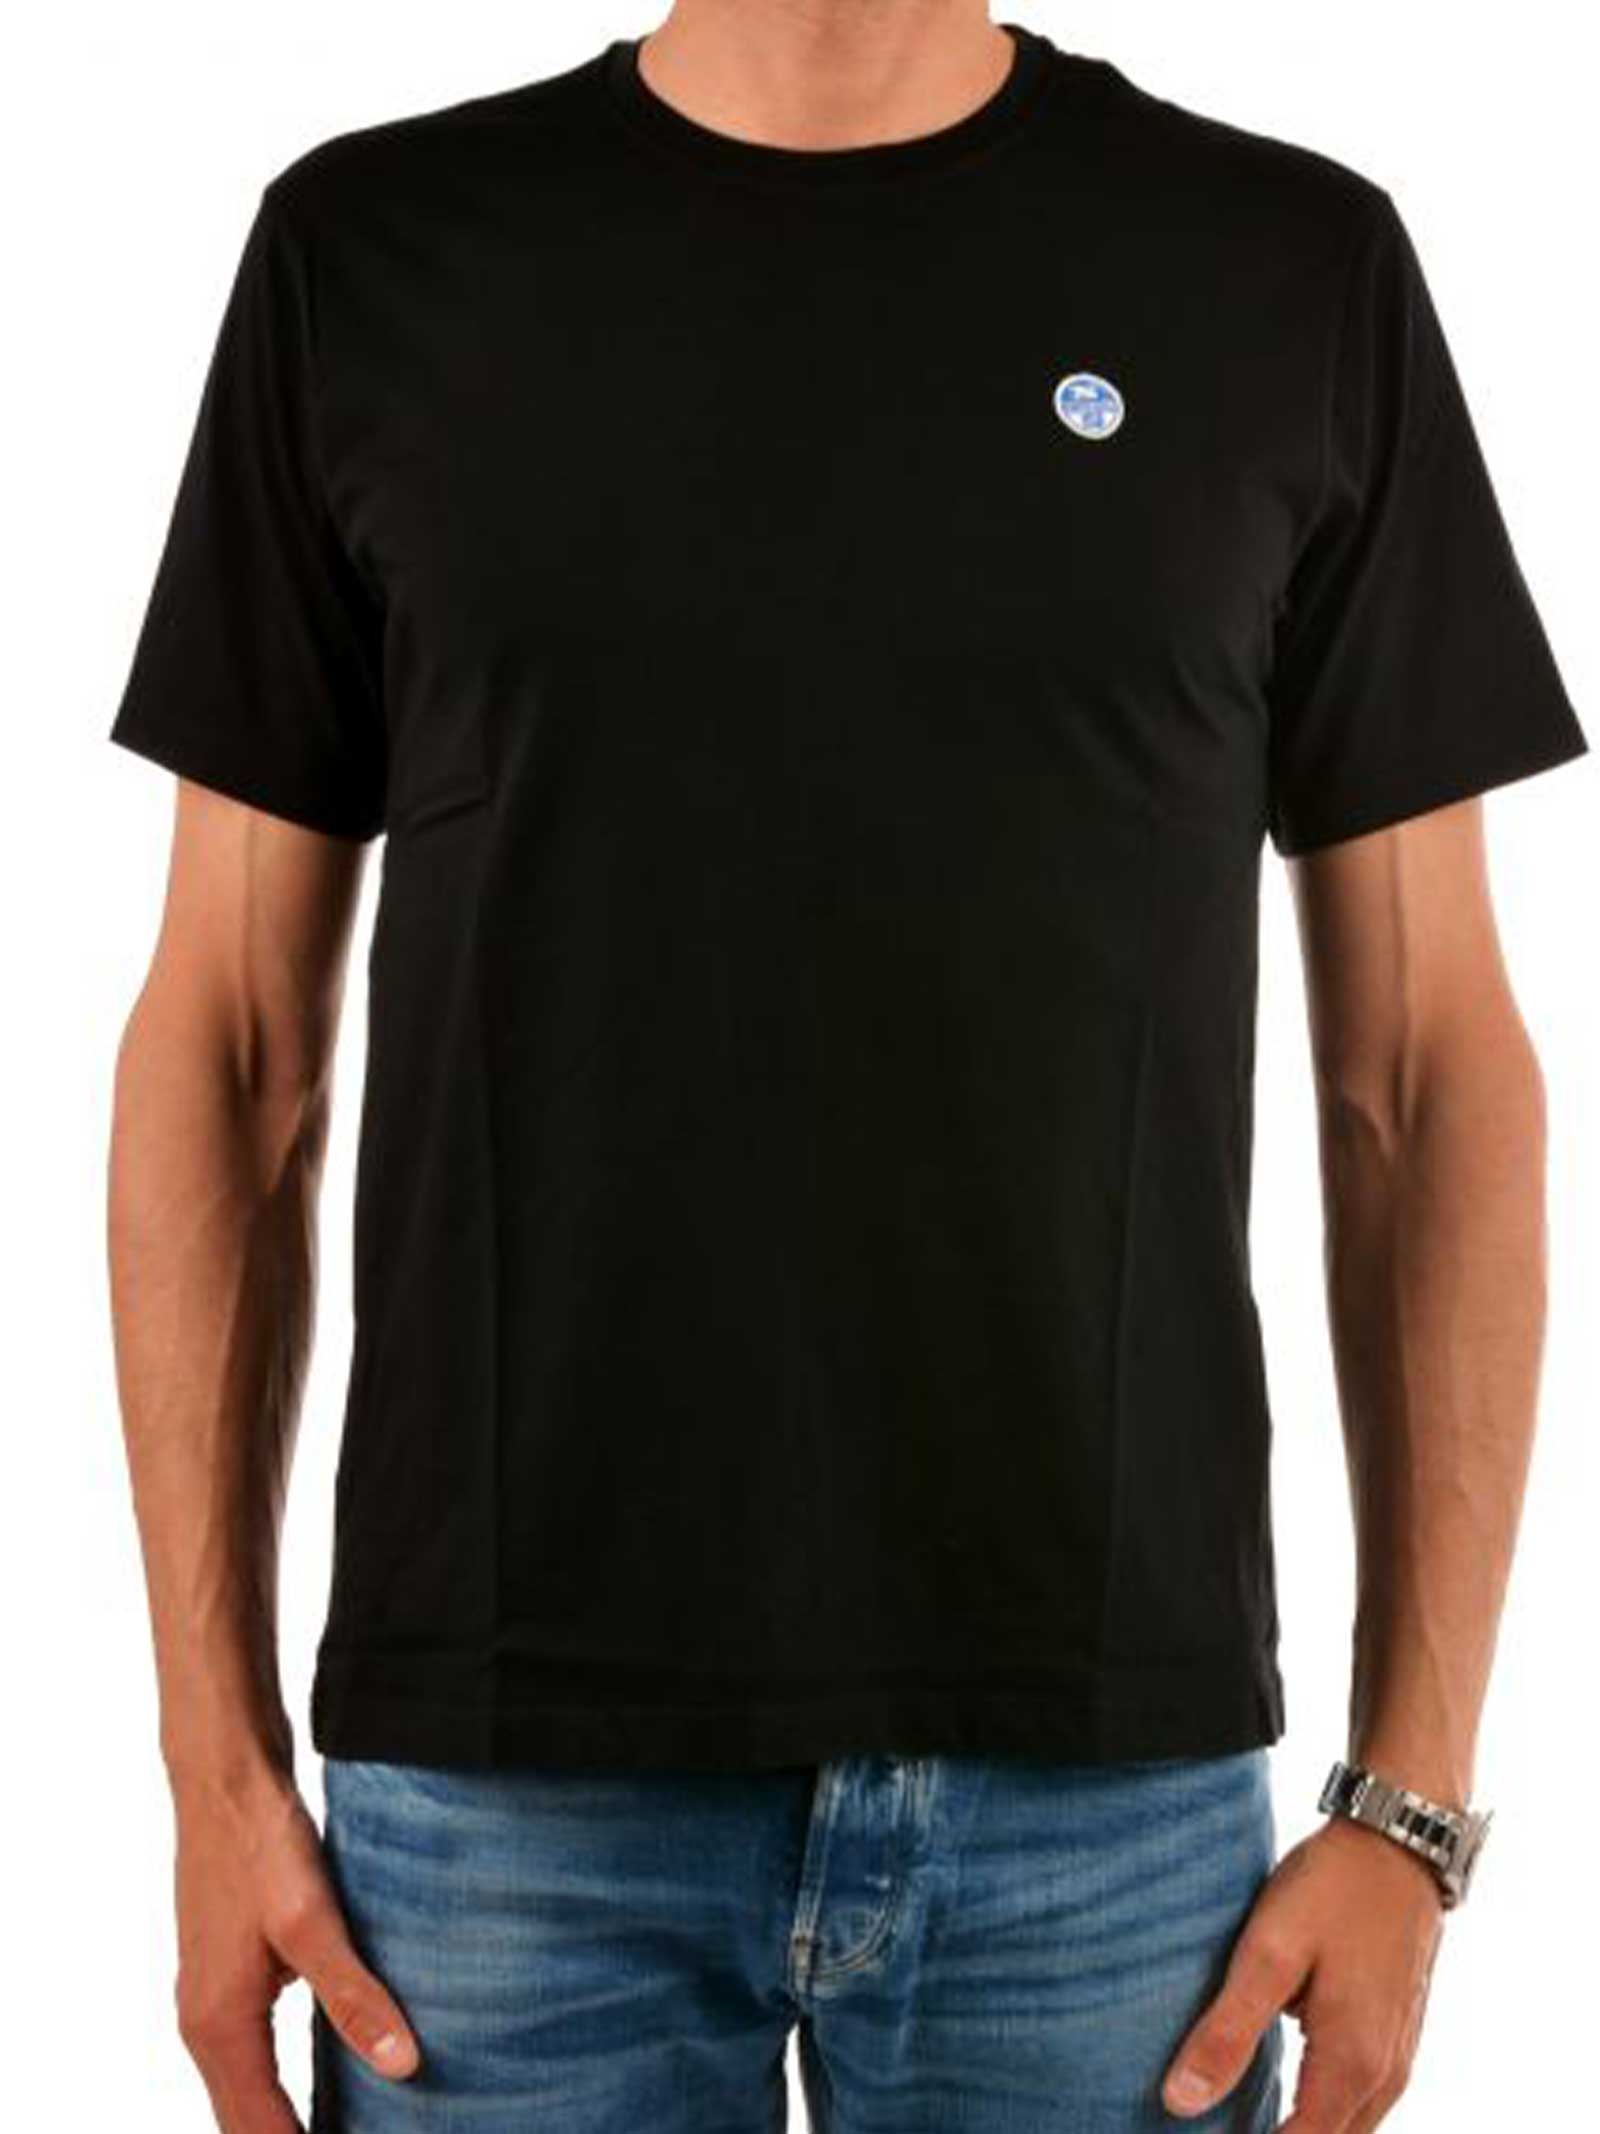 T-SHIRT UOMO NORTH SAILS   T-shirt   6925300999